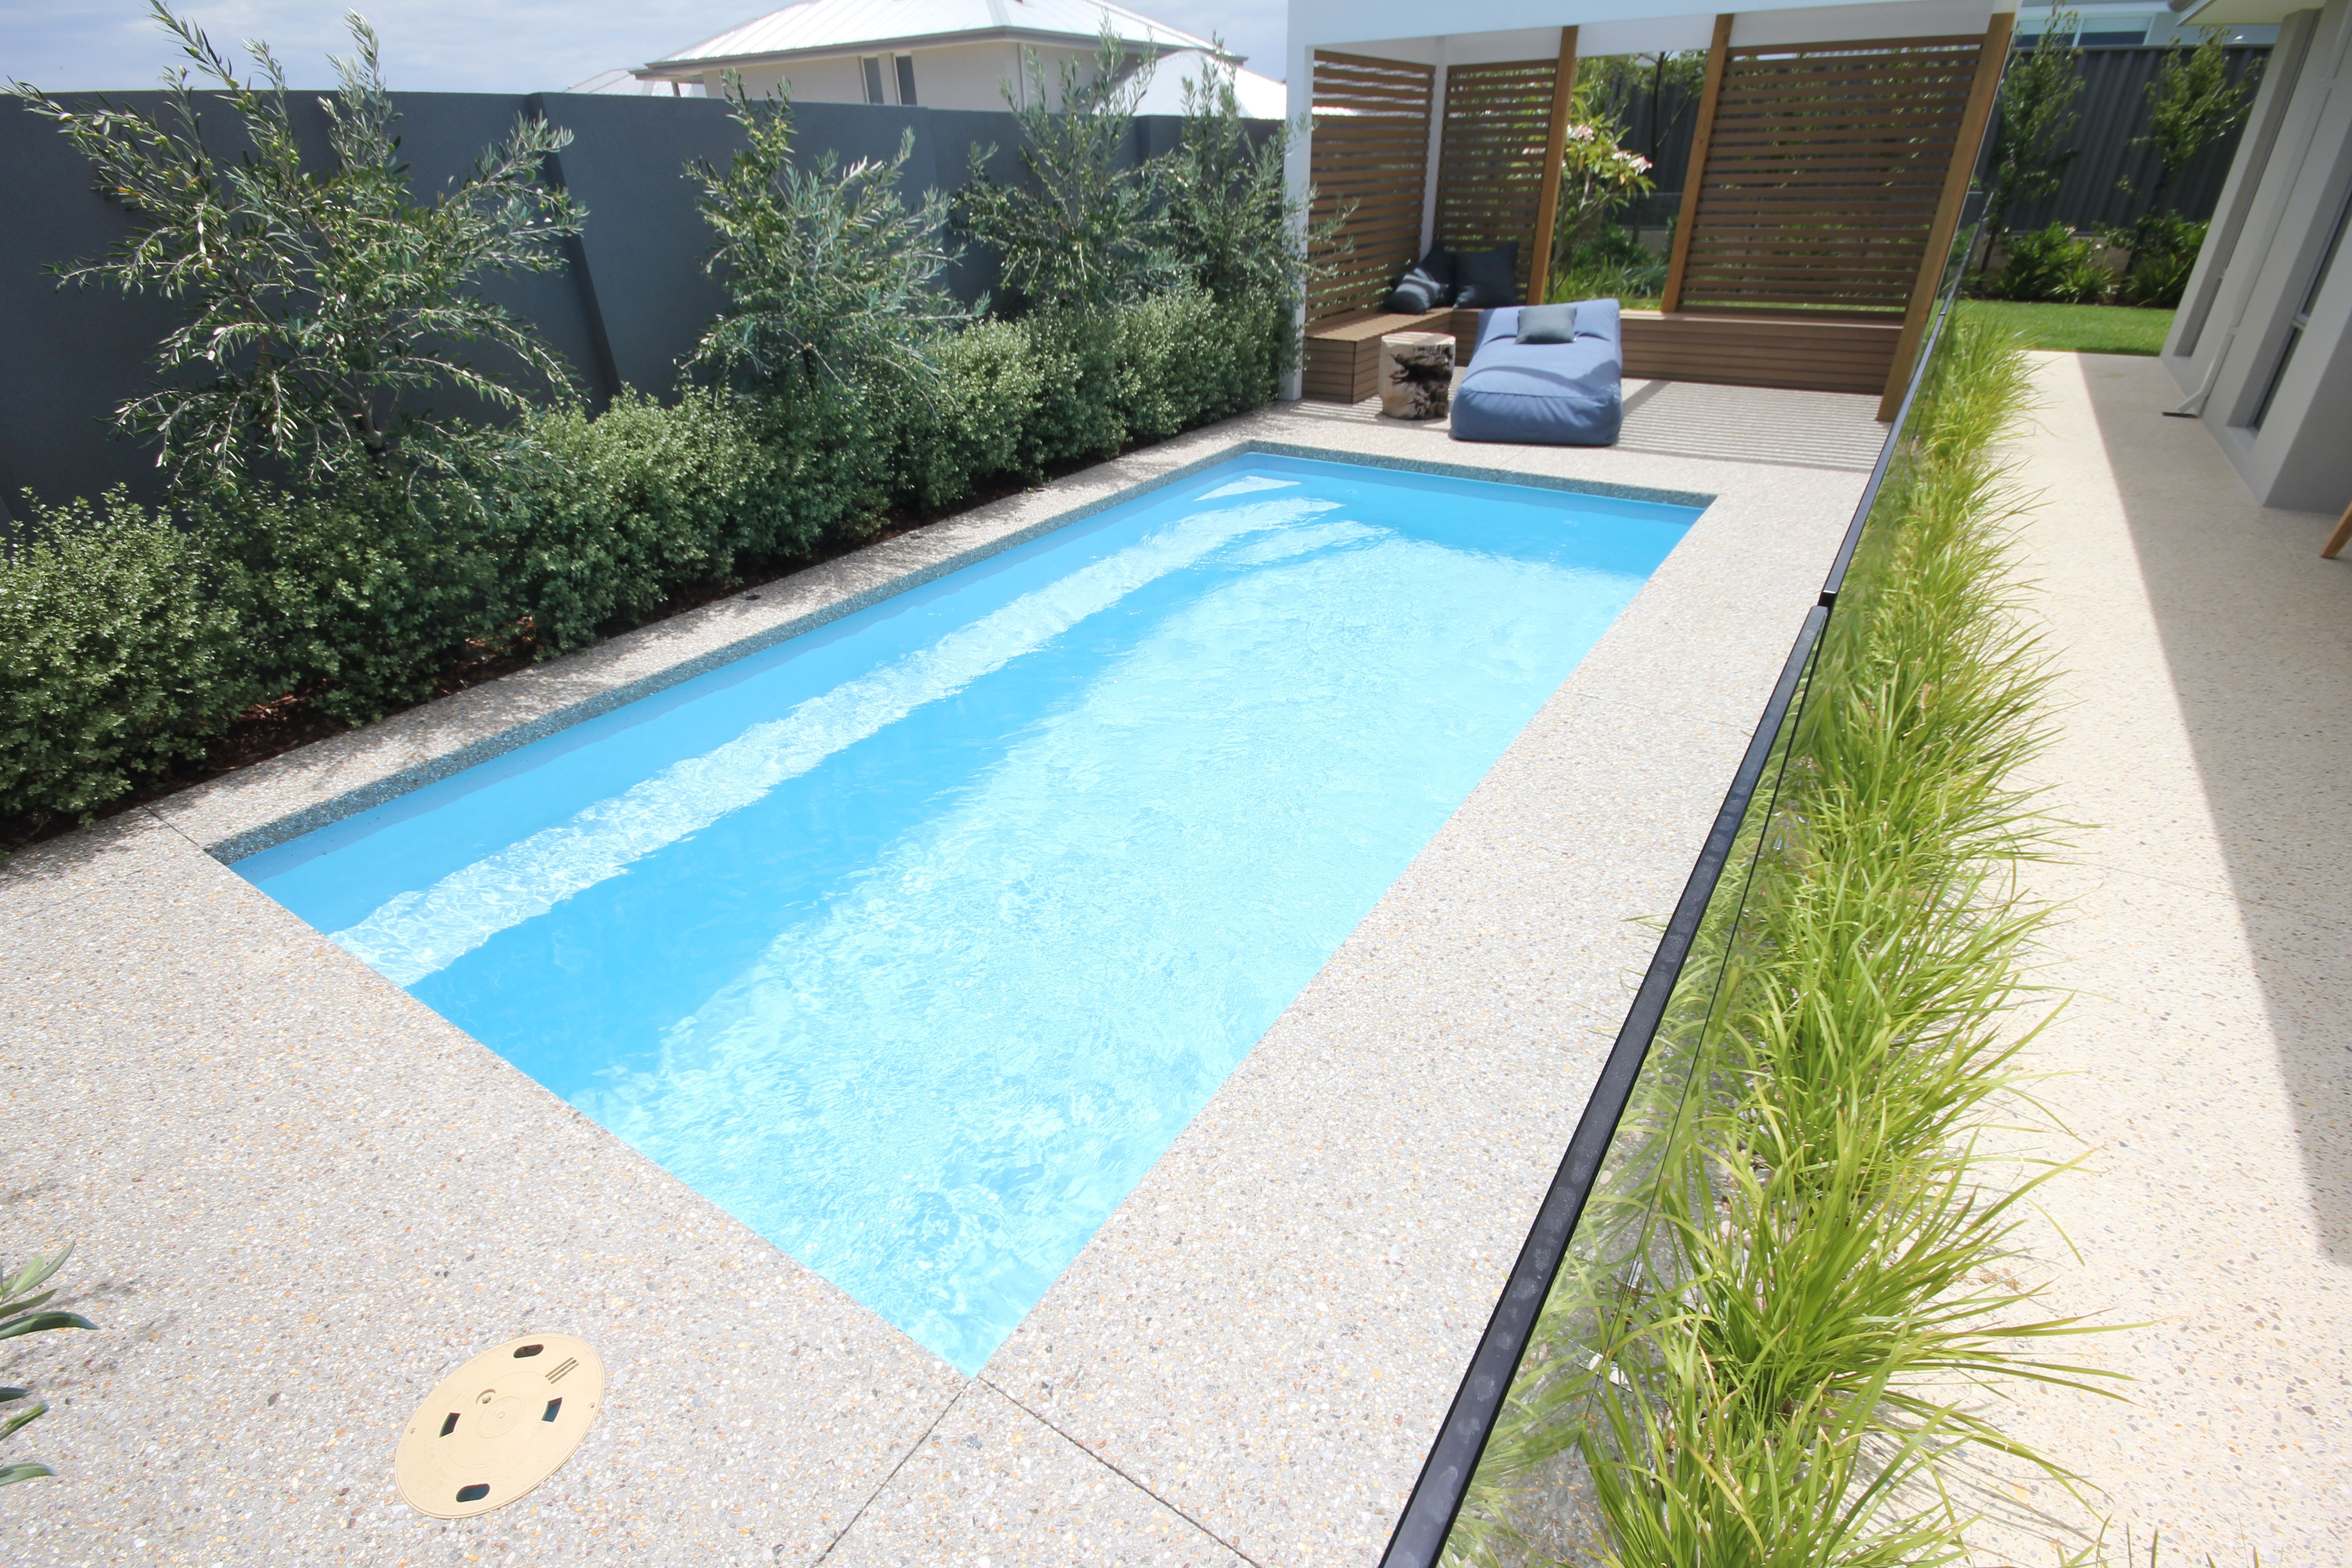 Empire 6m X 3m Swimming Pool Landscaping Swimming Pools Small Backyard Pools